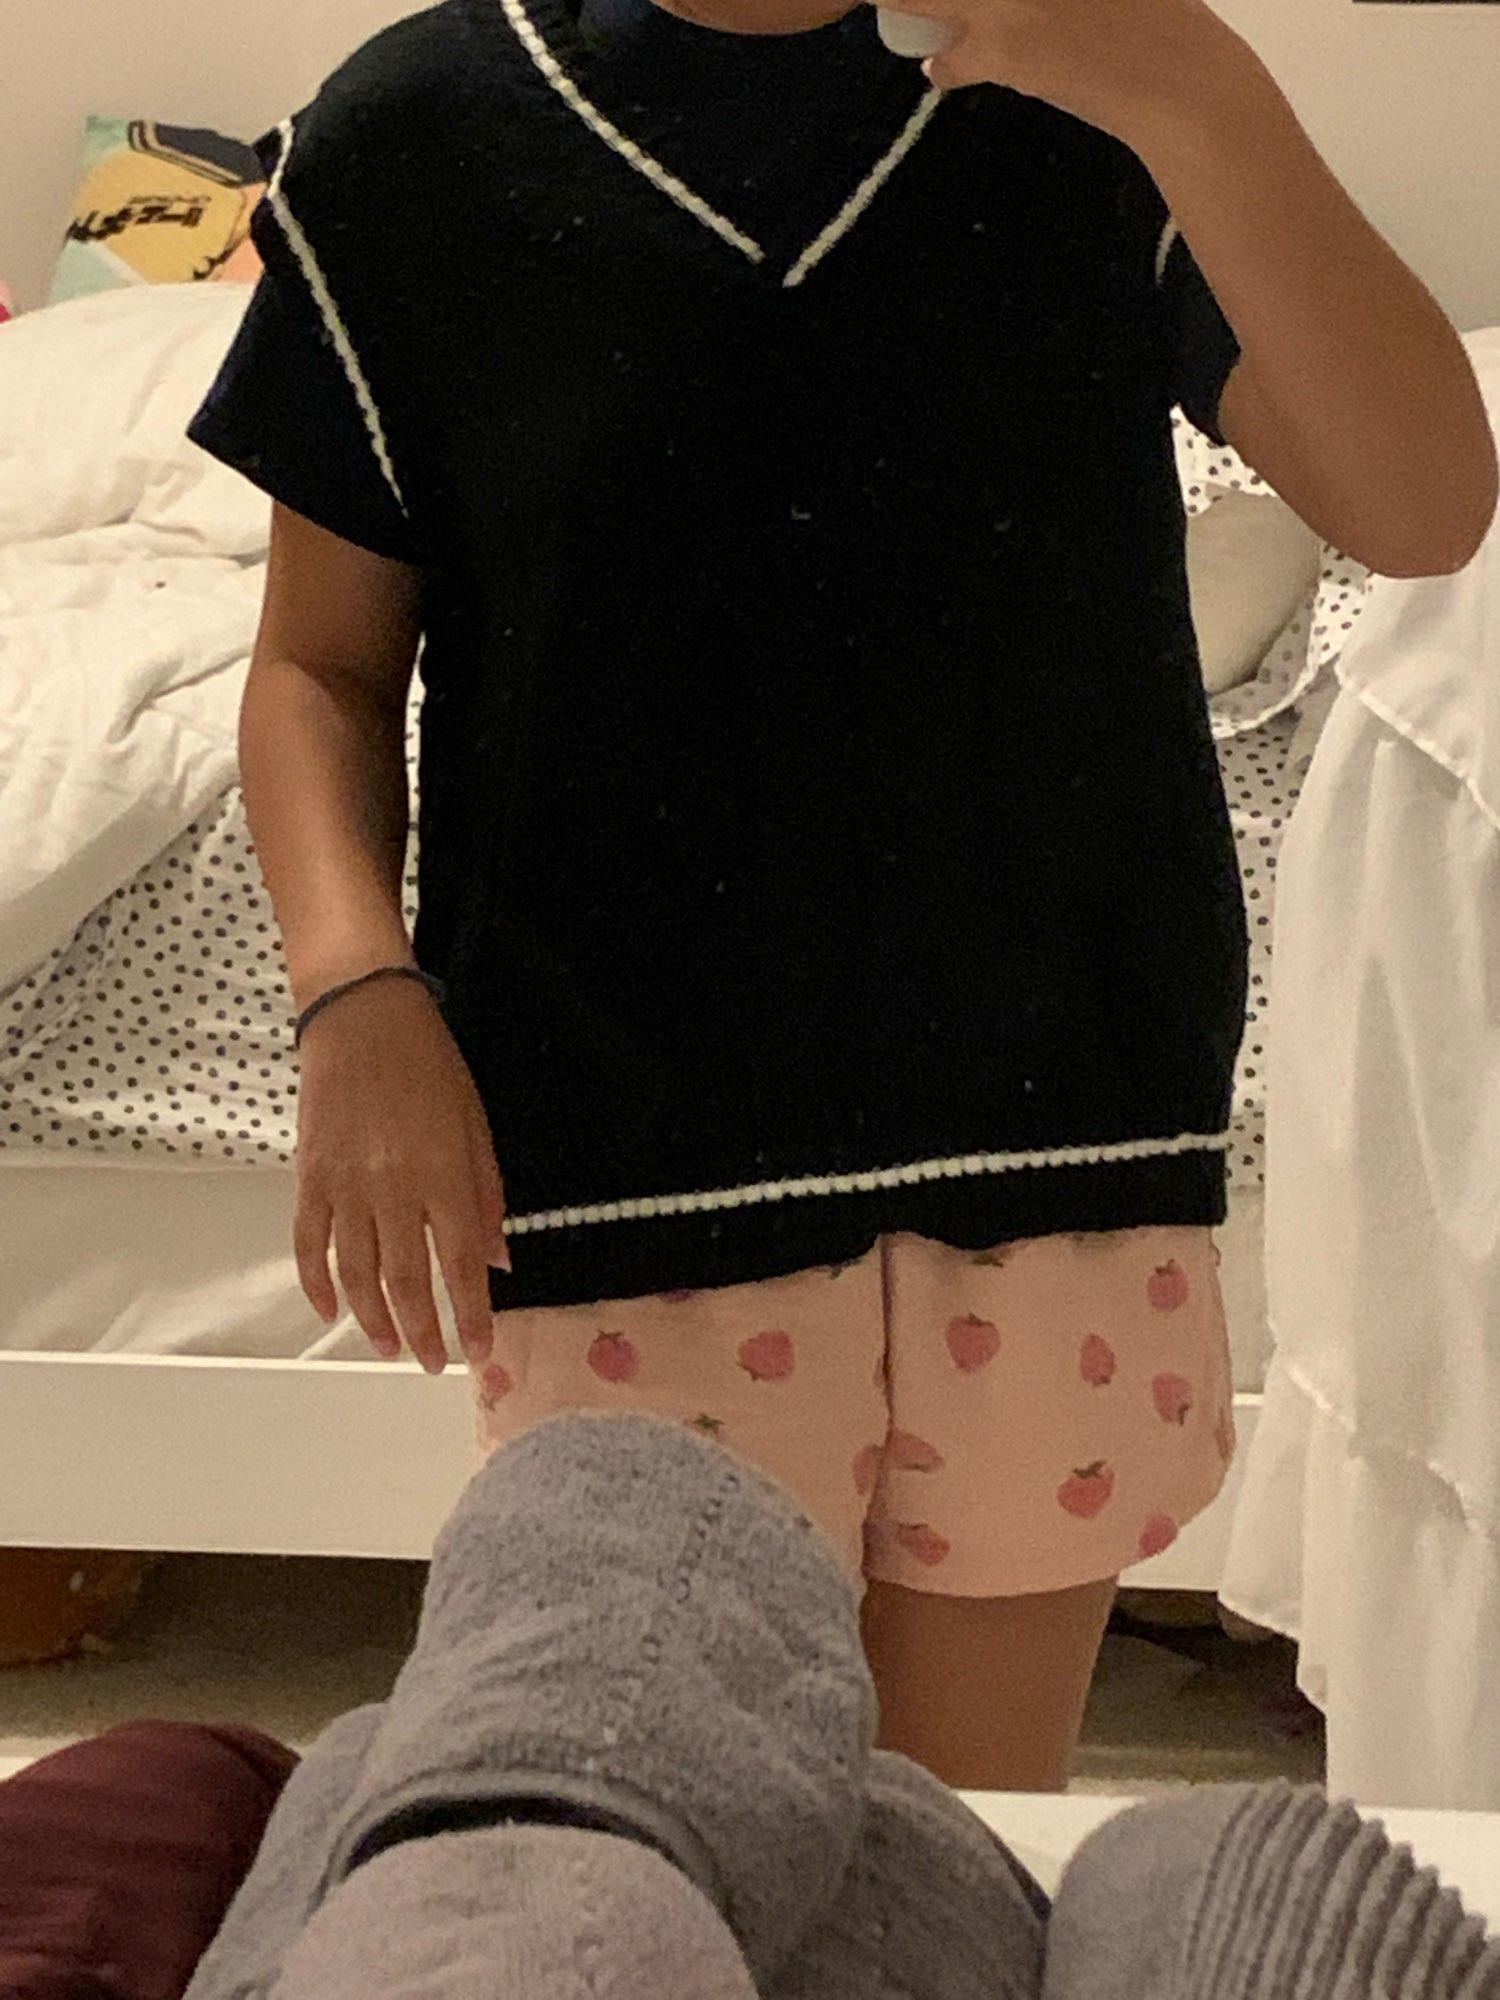 Harajuku Grunge E-girl  V-neck Knitted Vest photo review